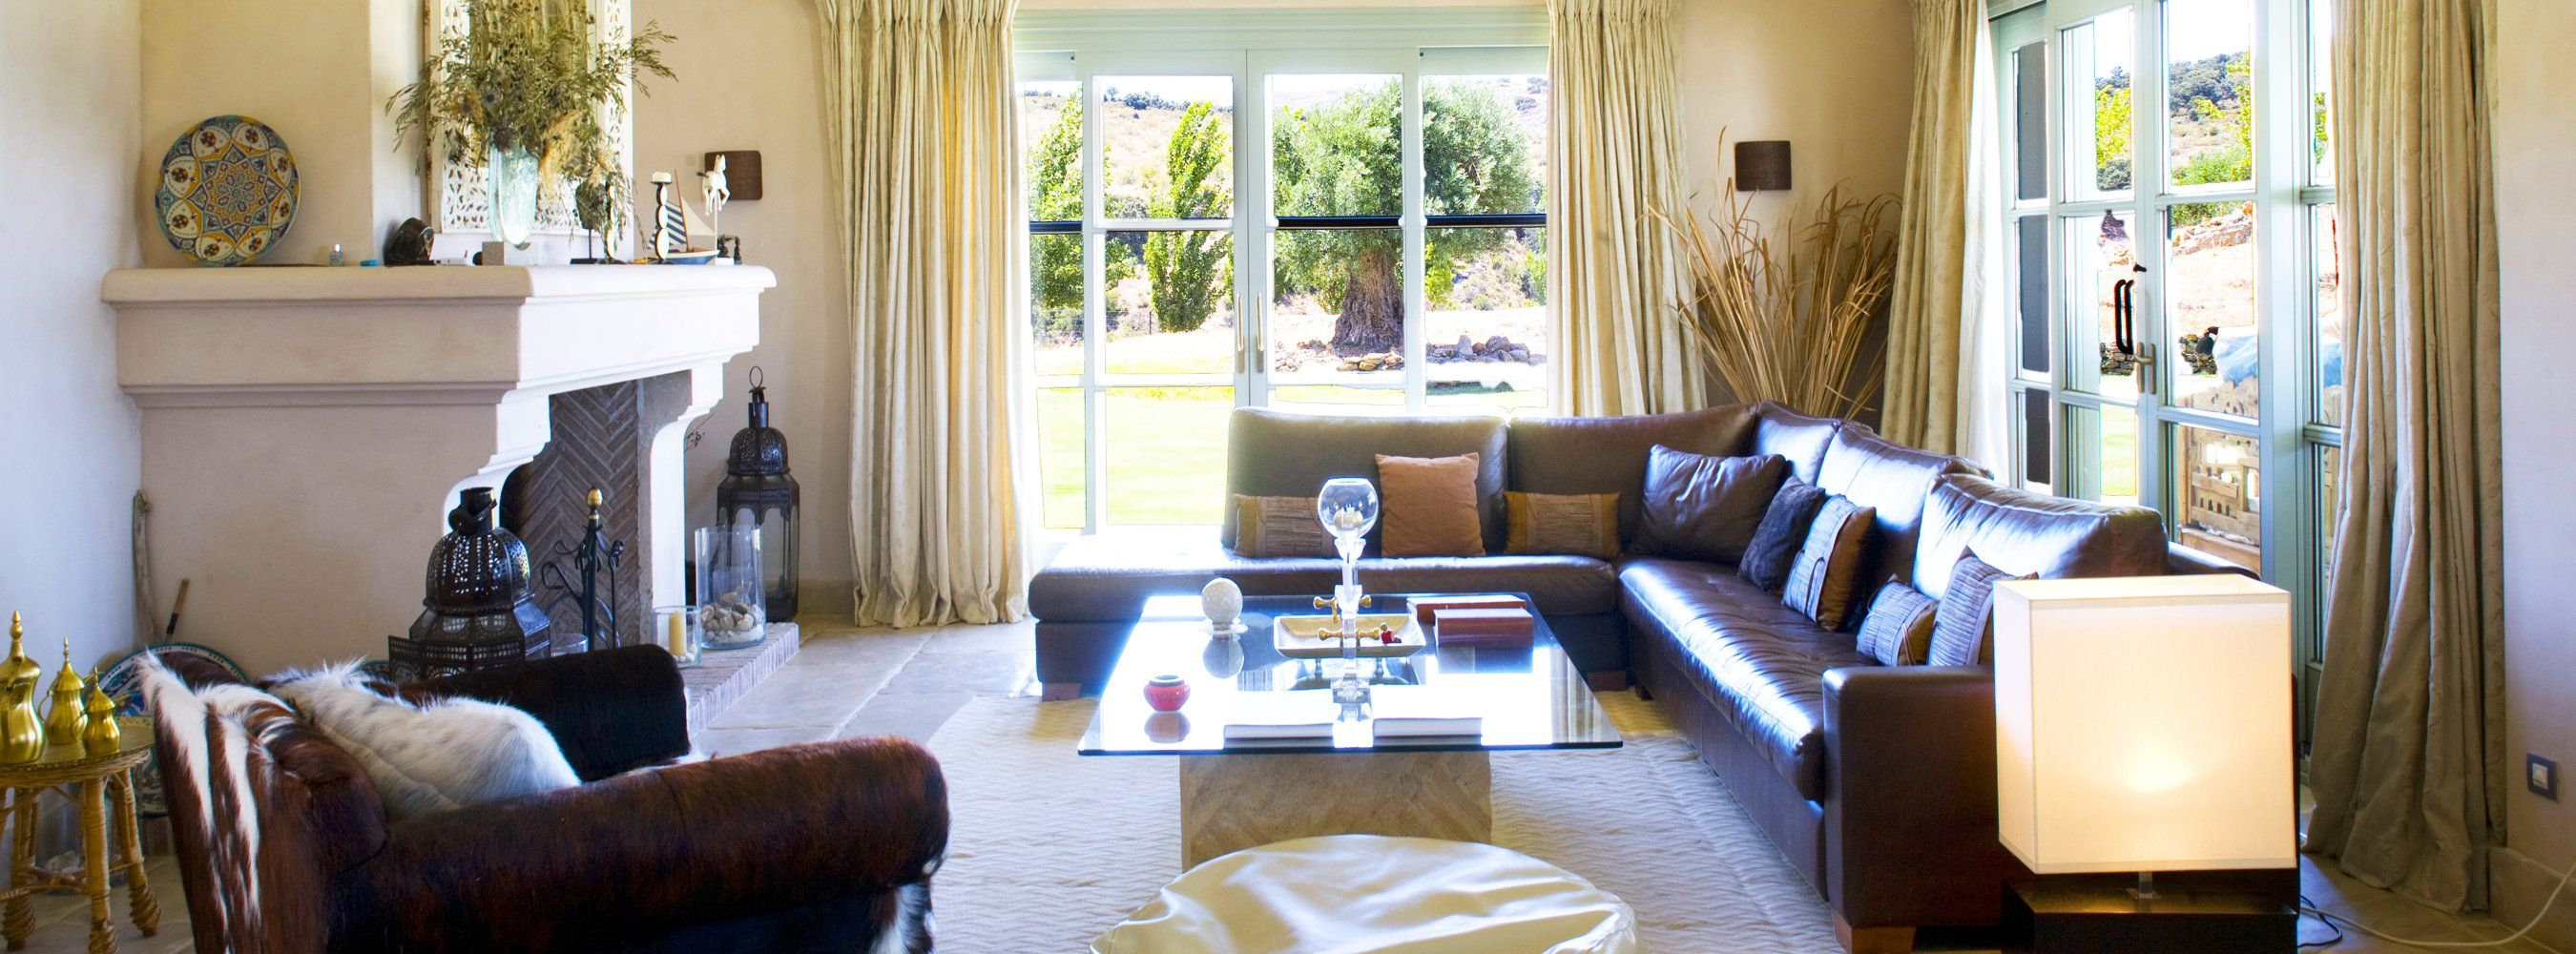 sitting room luxury villas andalucia